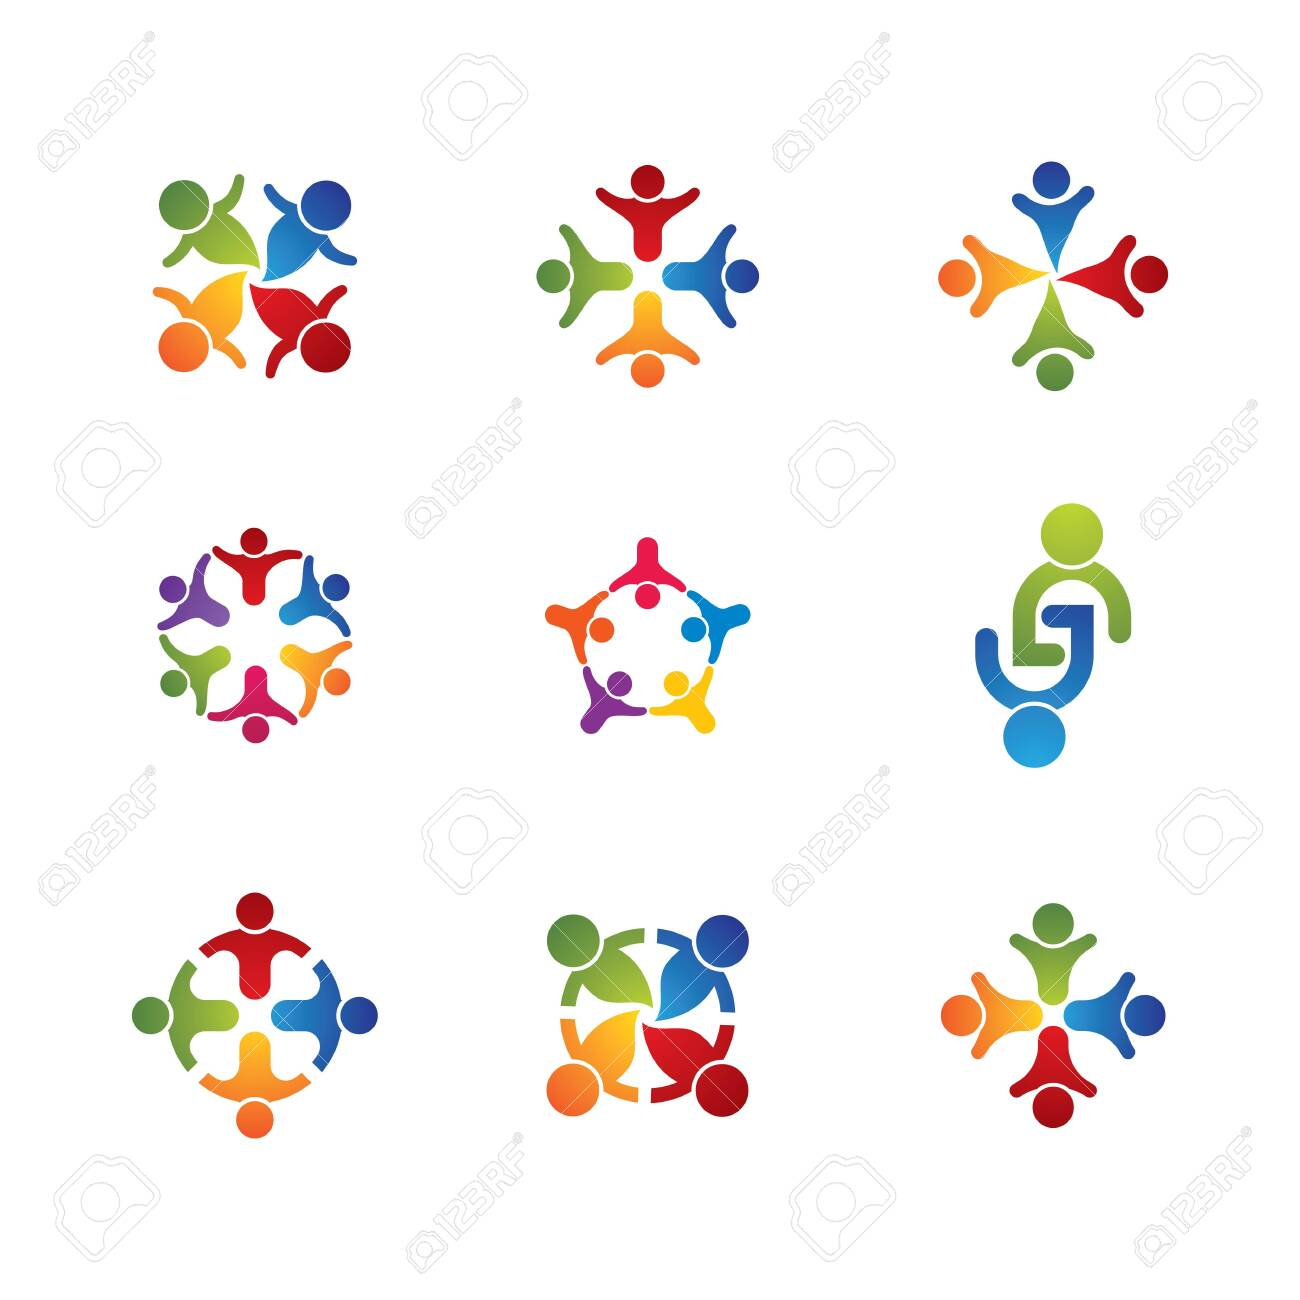 Community vector icon illustration design - 150506604